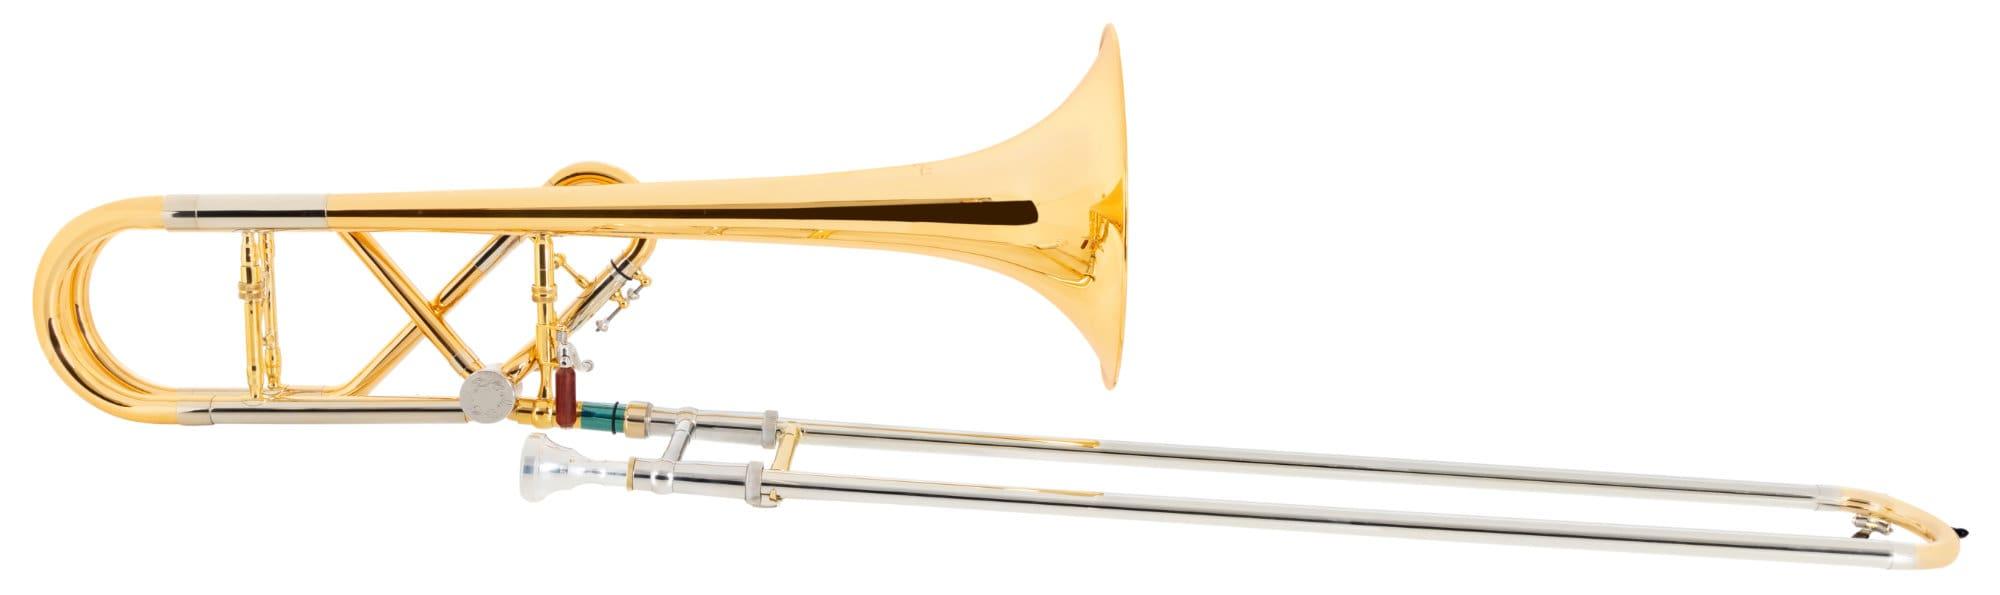 Posaunen - Lechgold QP 20GL Quartposaune Goldmessing - Onlineshop Musikhaus Kirstein